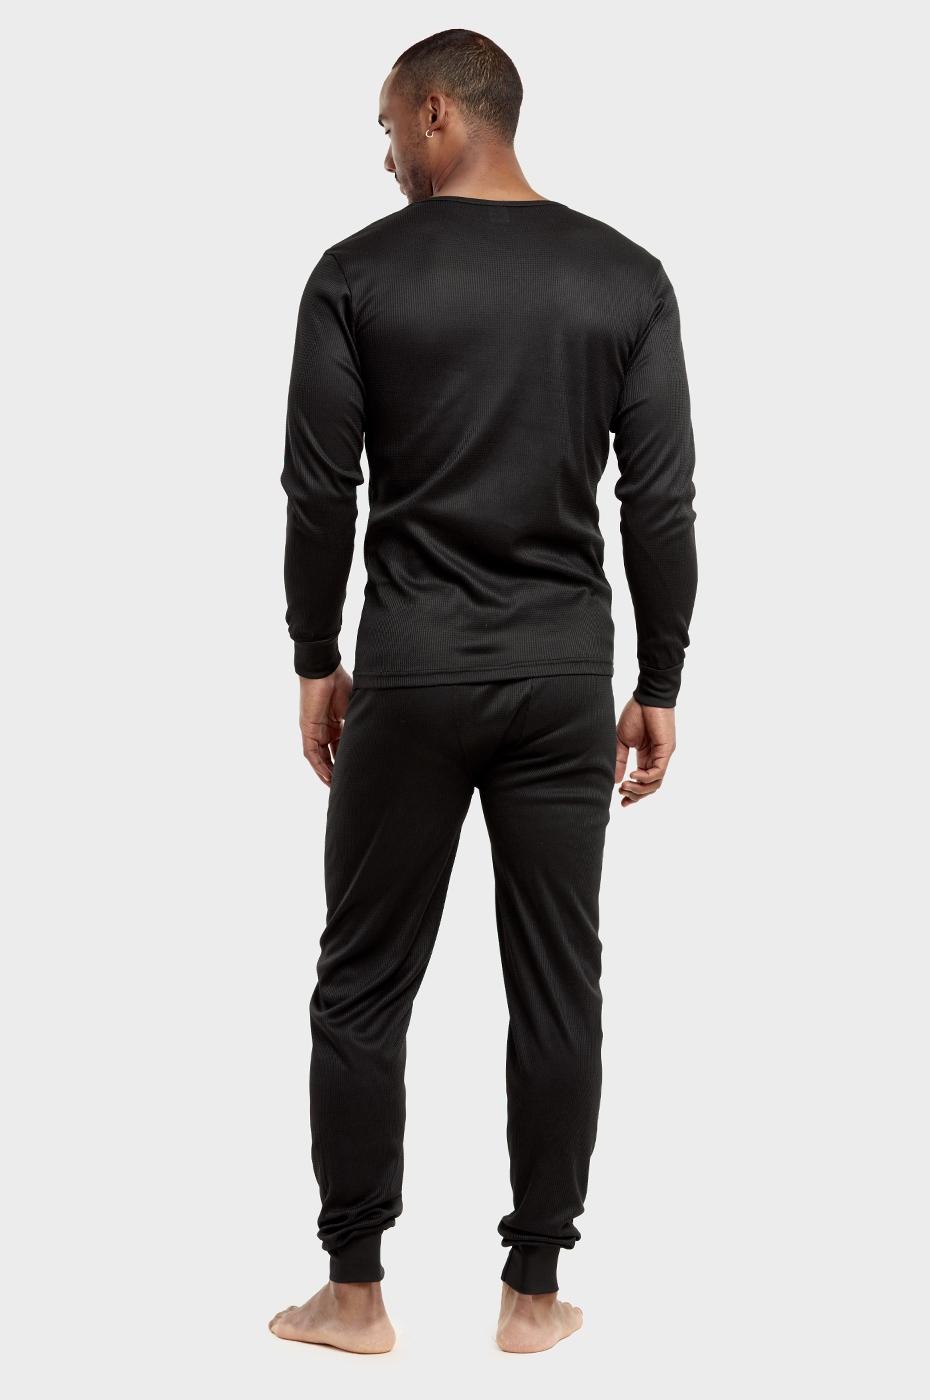 Men-039-s-Thermal-Long-Underwear-Top-Bottom-Medium-Weight-Waffle-Knit-Warm-Layering miniatuur 3